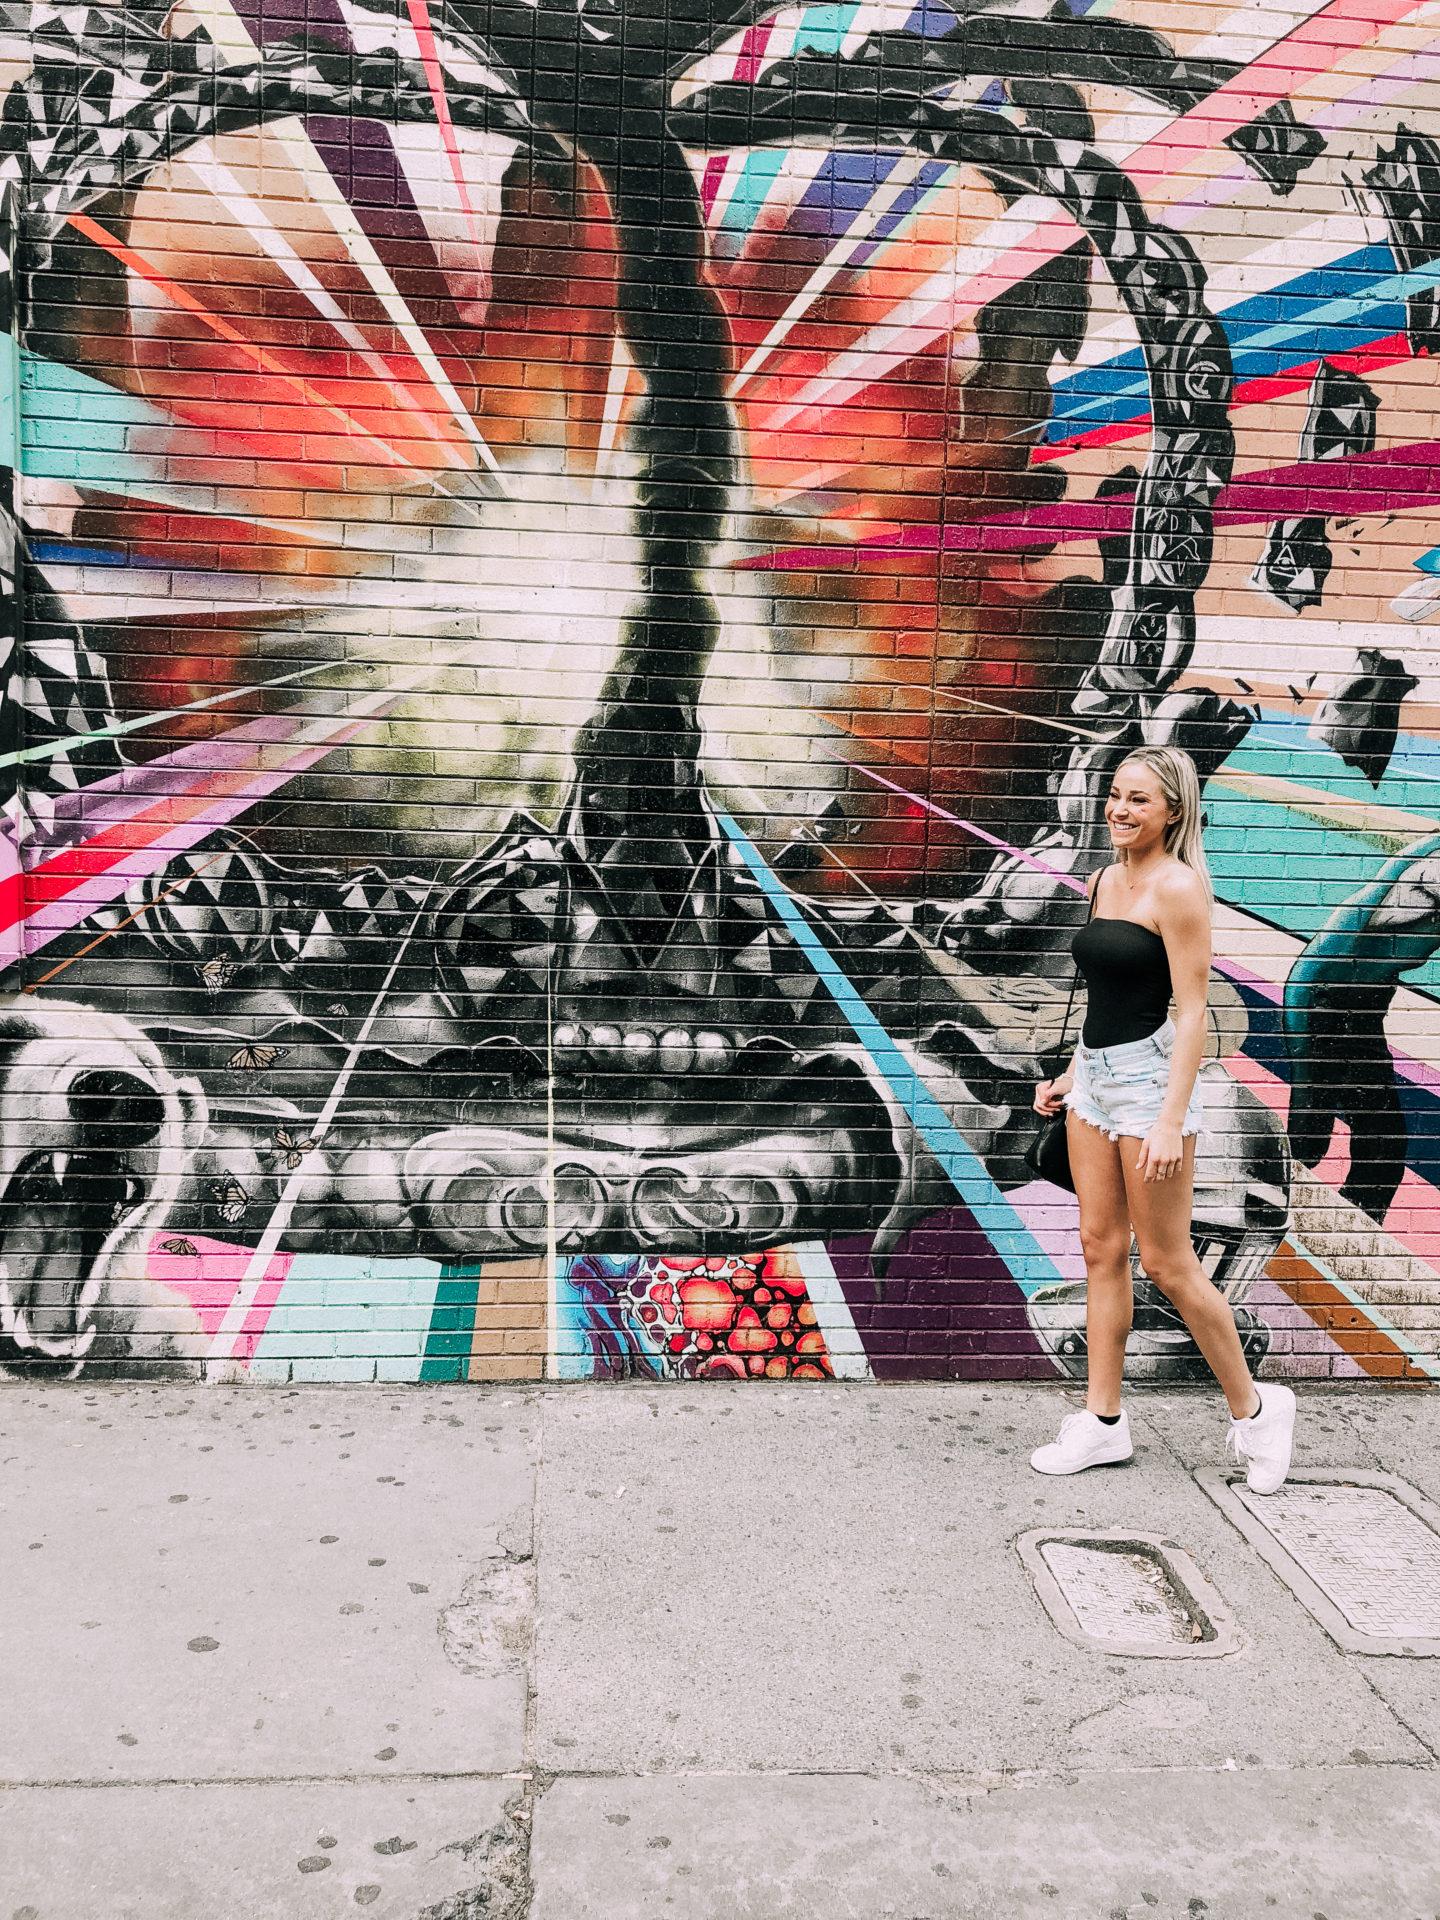 Peyton Mabry - Dallas Fashion Model, Fashion & Lifestyle Blogger